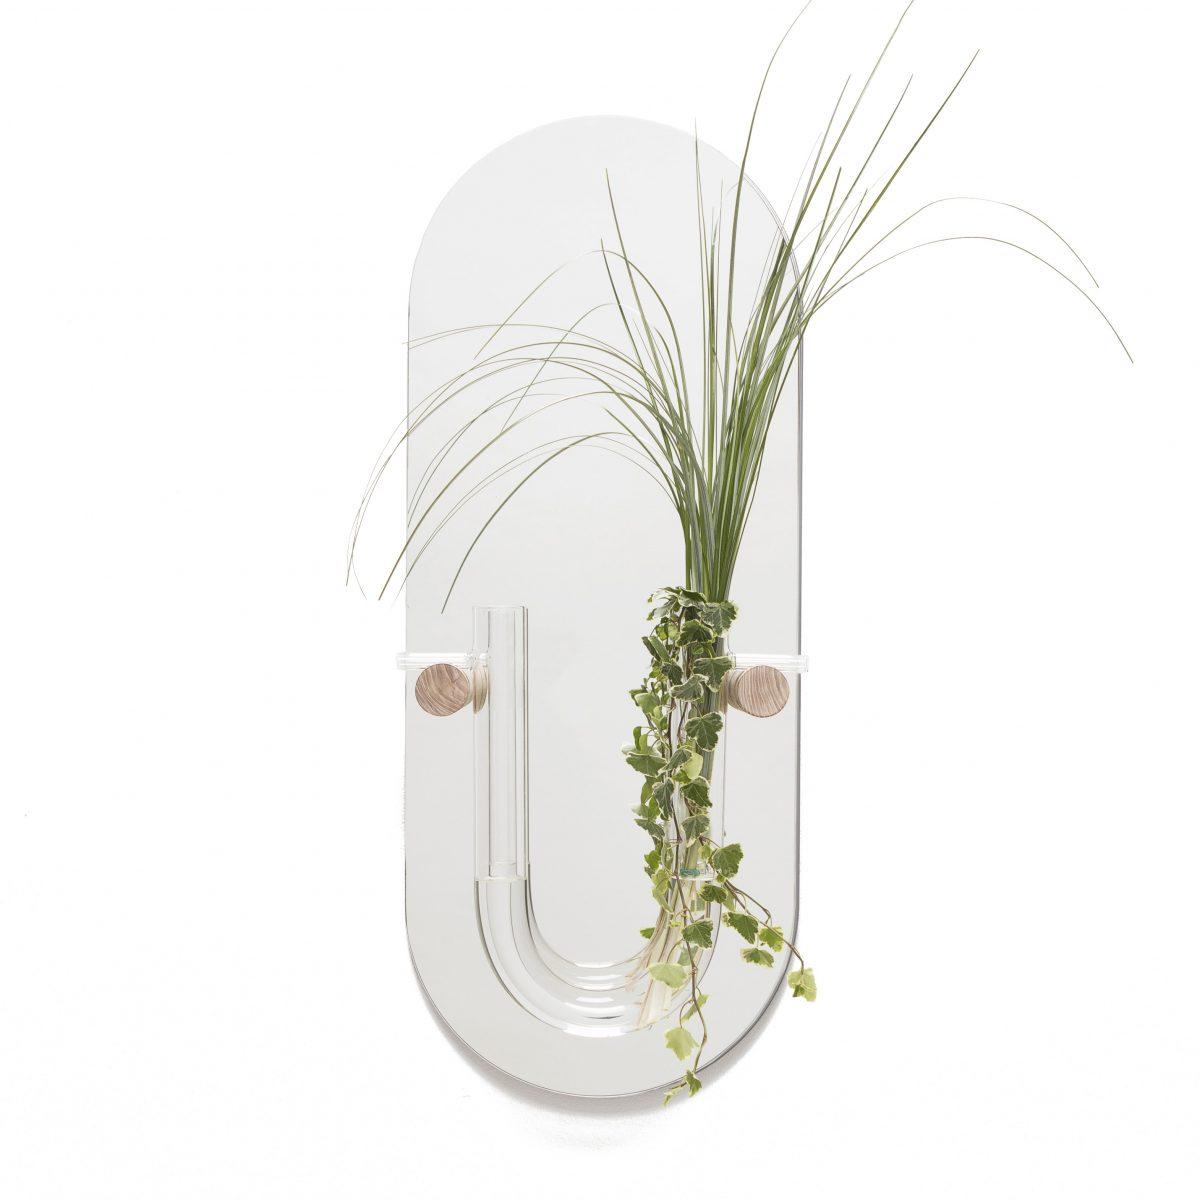 Wandvaas Plant Spiegel You Tube M Helder Glas Gimmii Shop